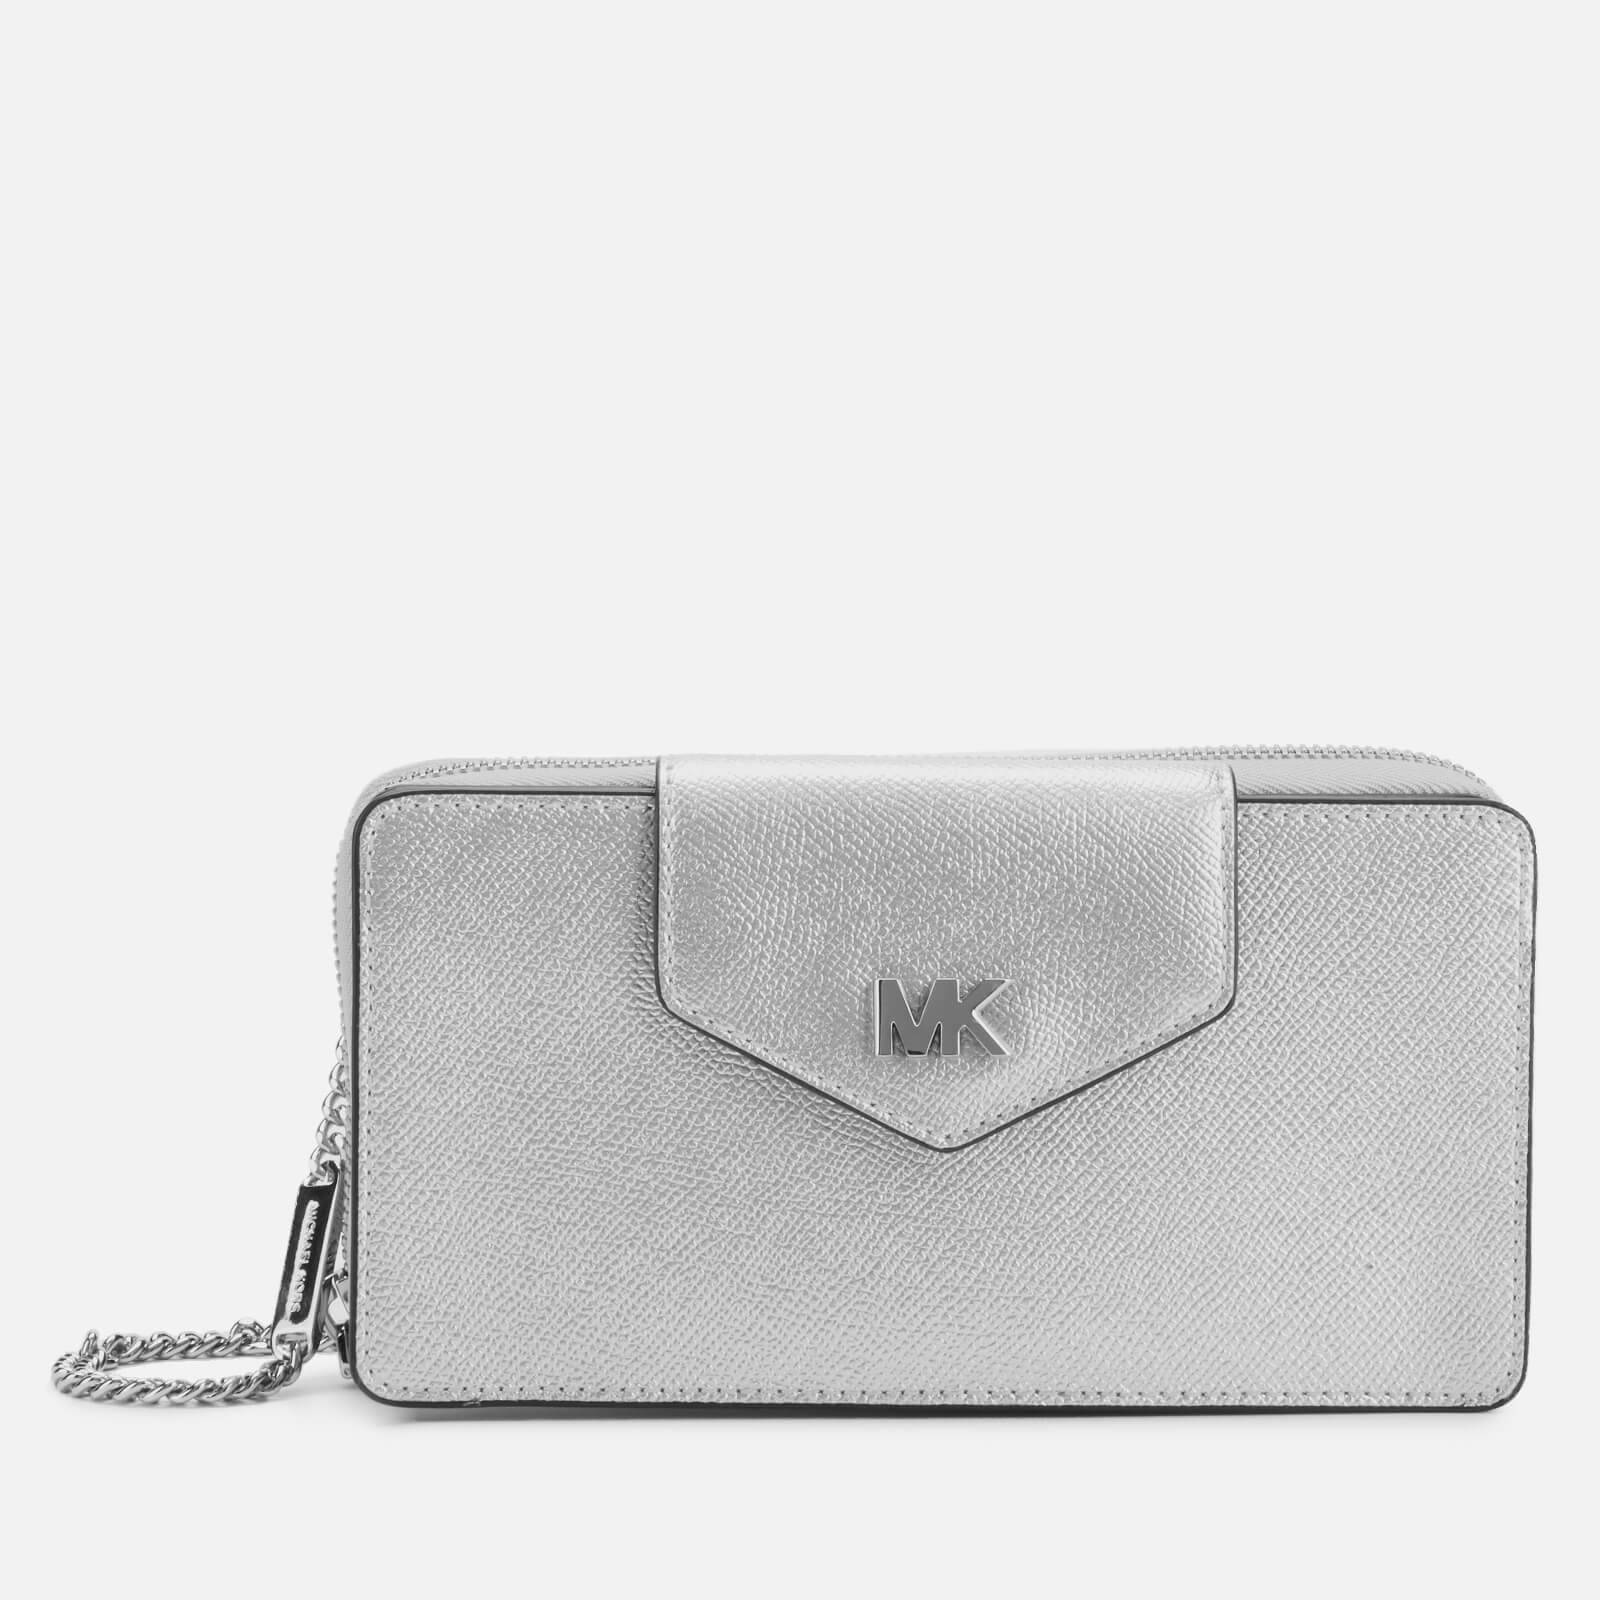 MICHAEL MICHAEL KORS Women's Small Convertible Phone Cross Body Bag - Silver